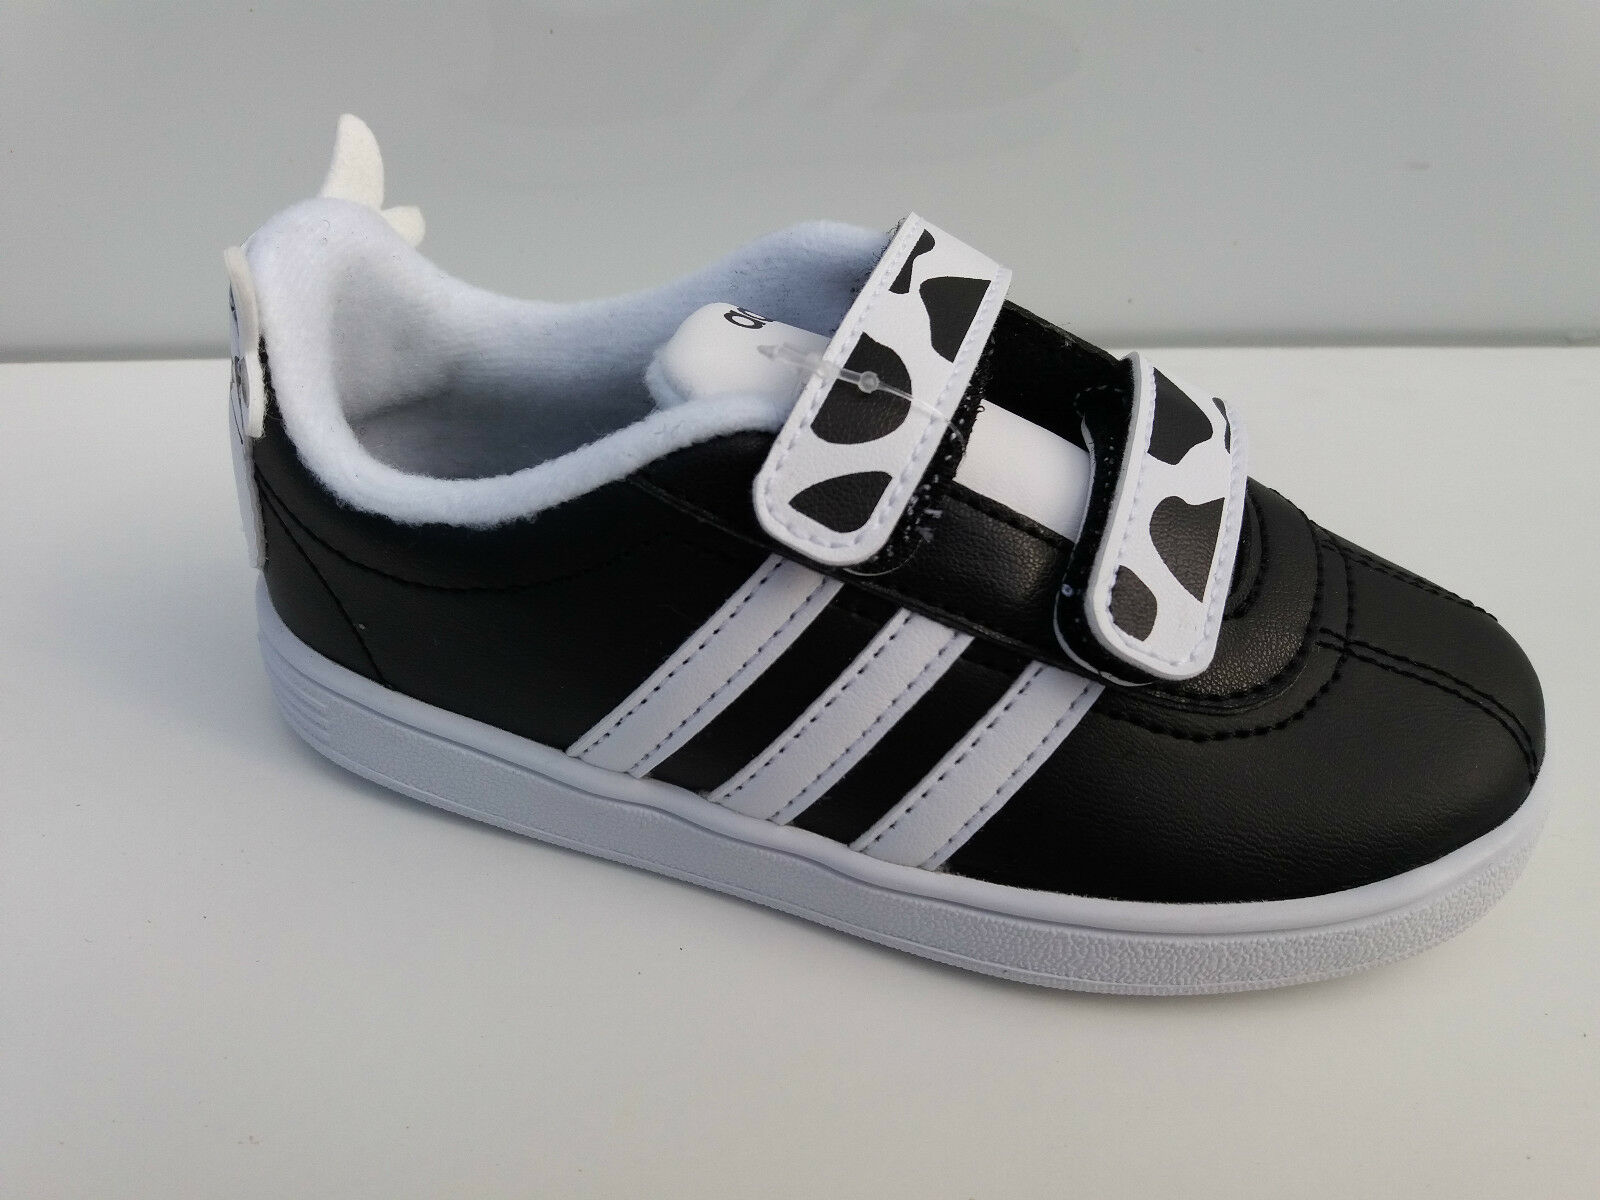 Adidas Kinder Schuhe Sneaker Turnschuhe Court Animal 20 21